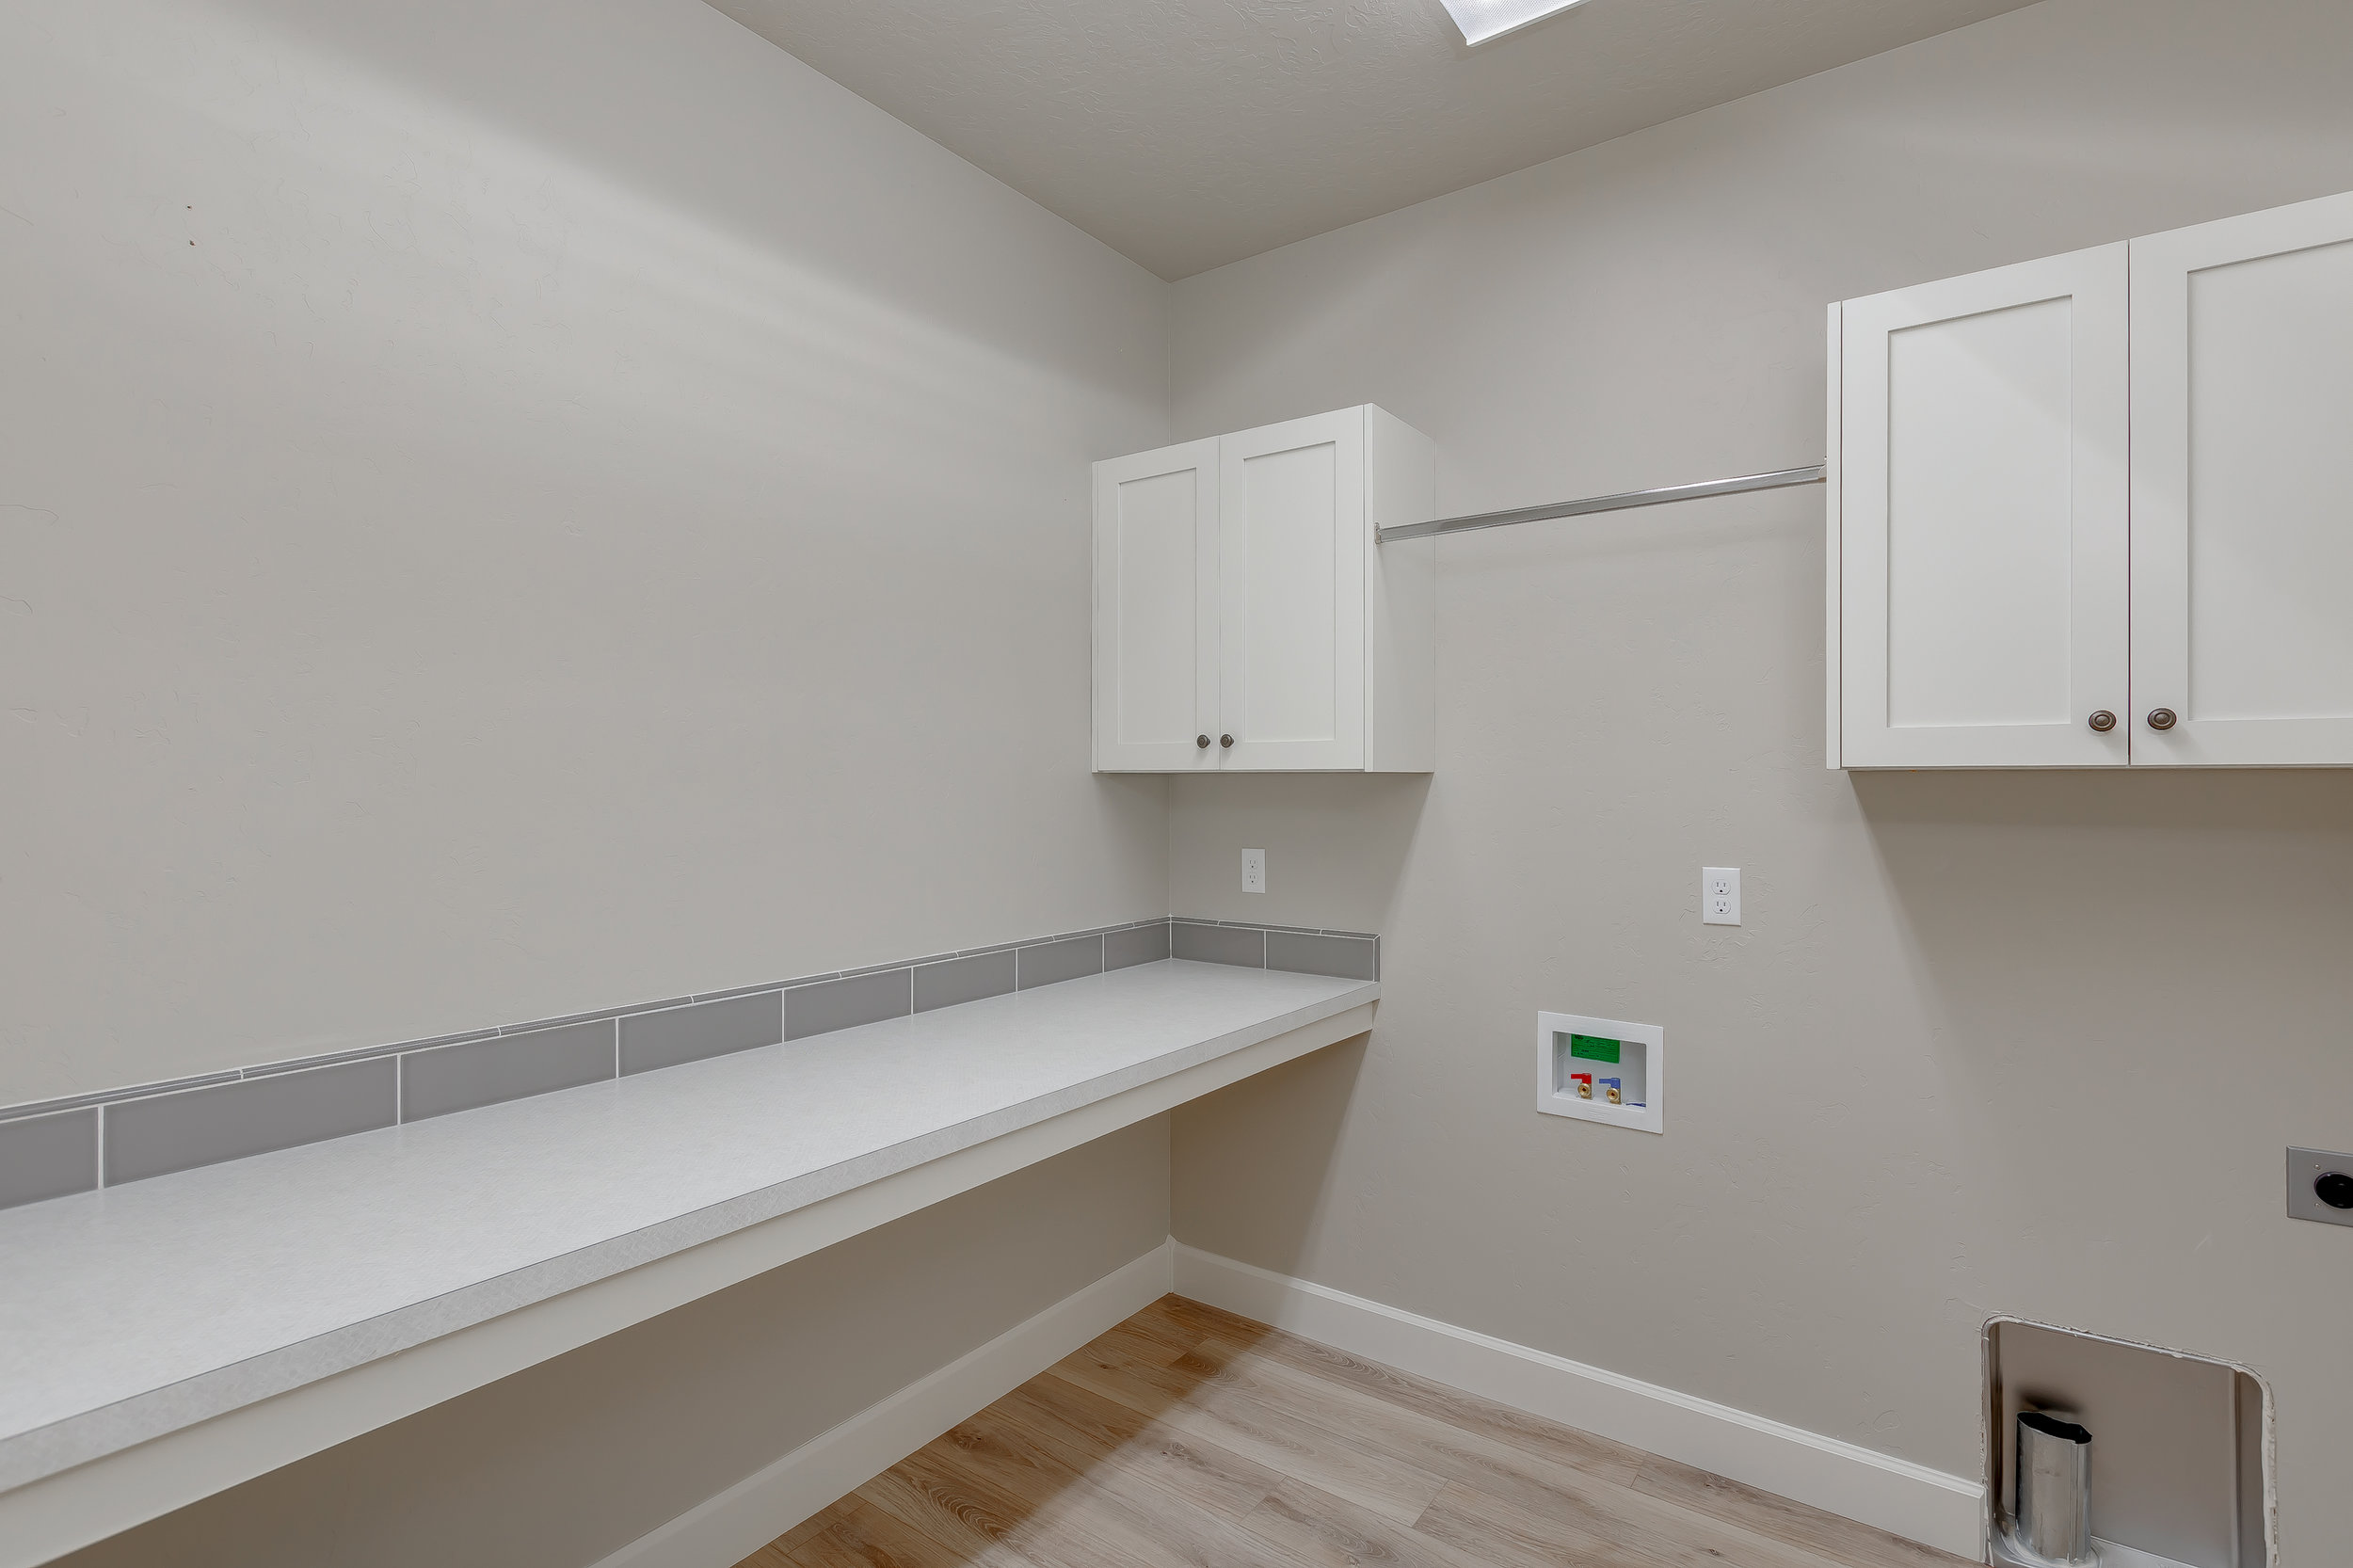 26-Laundry Room.jpg